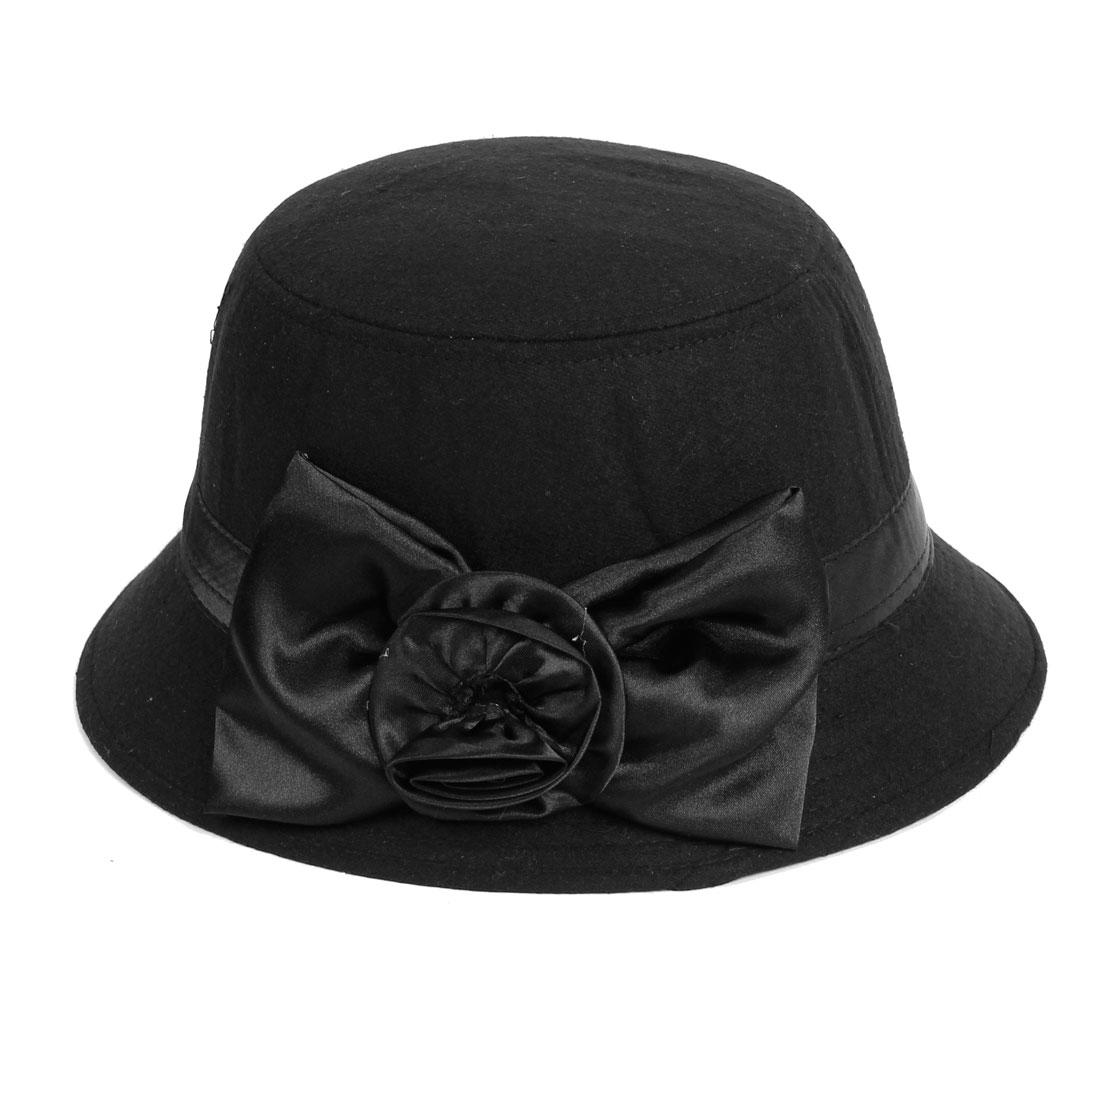 Black Flower Bowknot Accent Woolen Cloche Bucket Hat L for Ladies